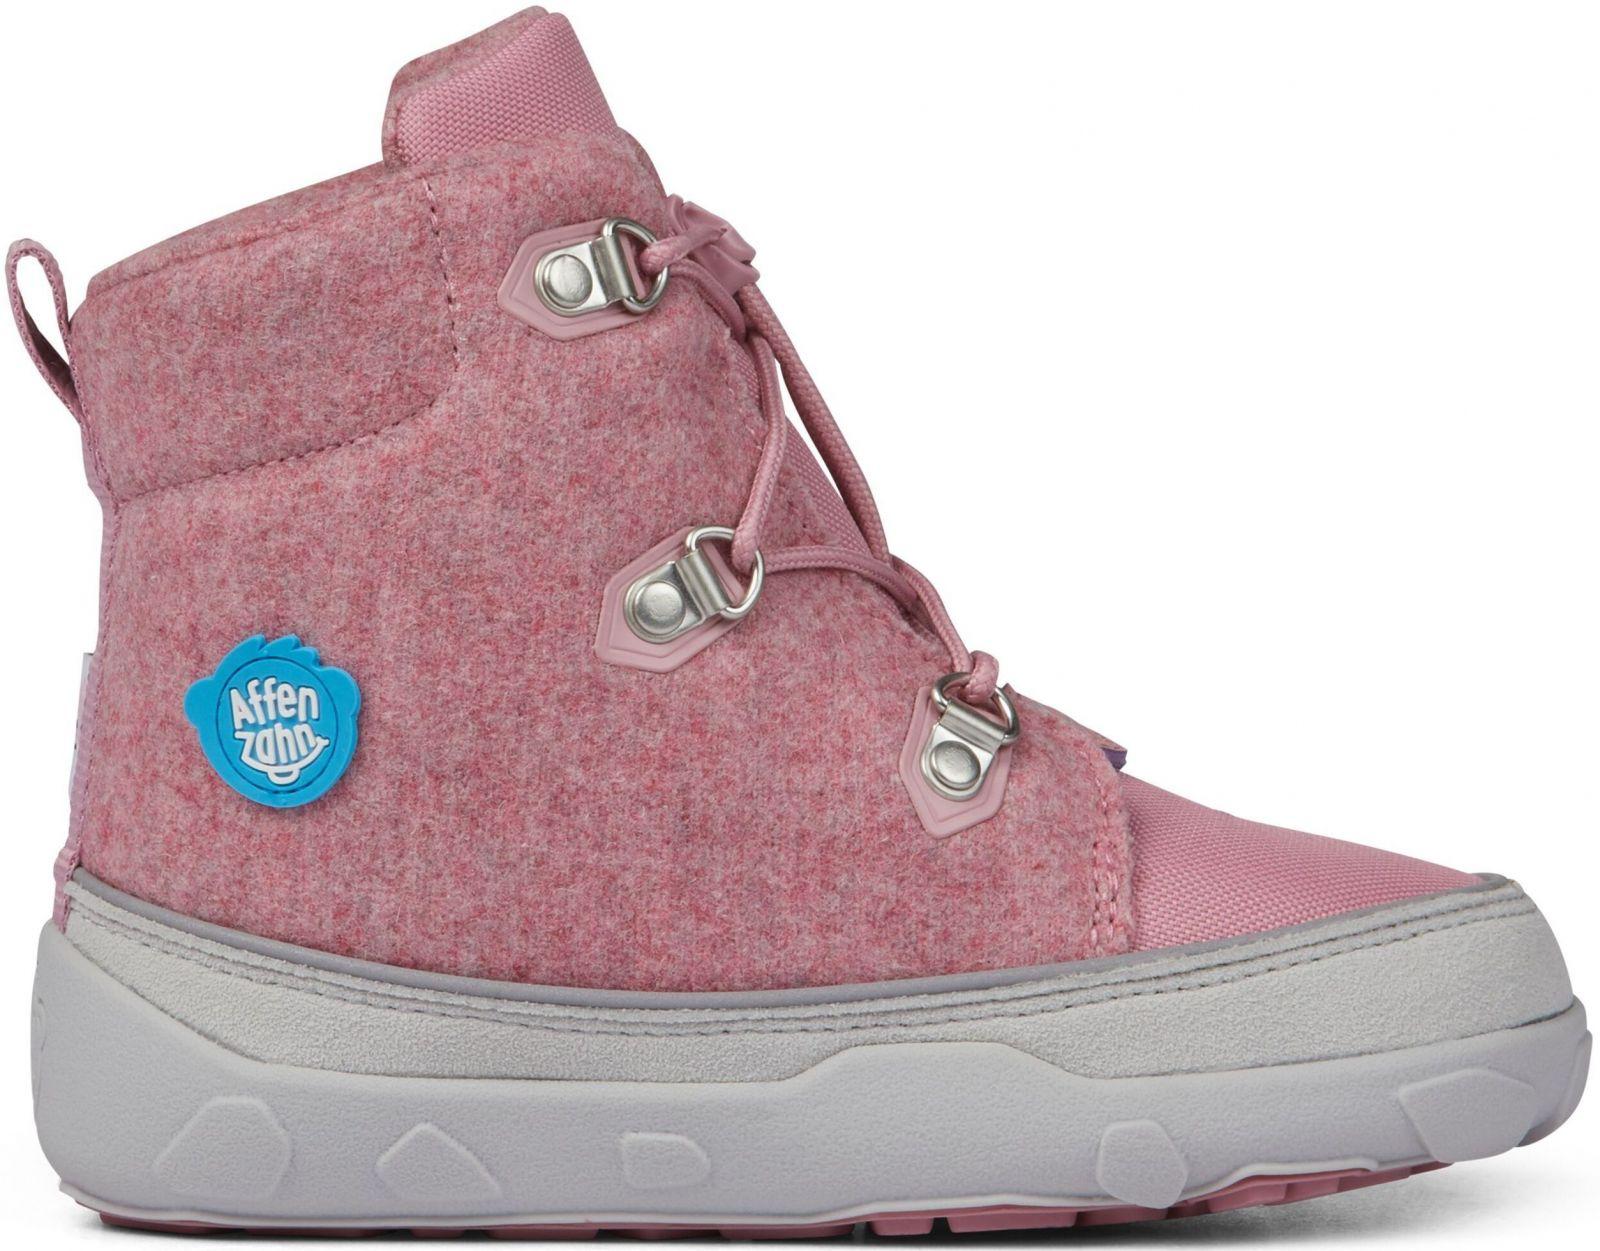 Barefoot Dětské barefoot botičky Affenzahn Minimal Midboot Wool Lace Unicorn - Pink bosá